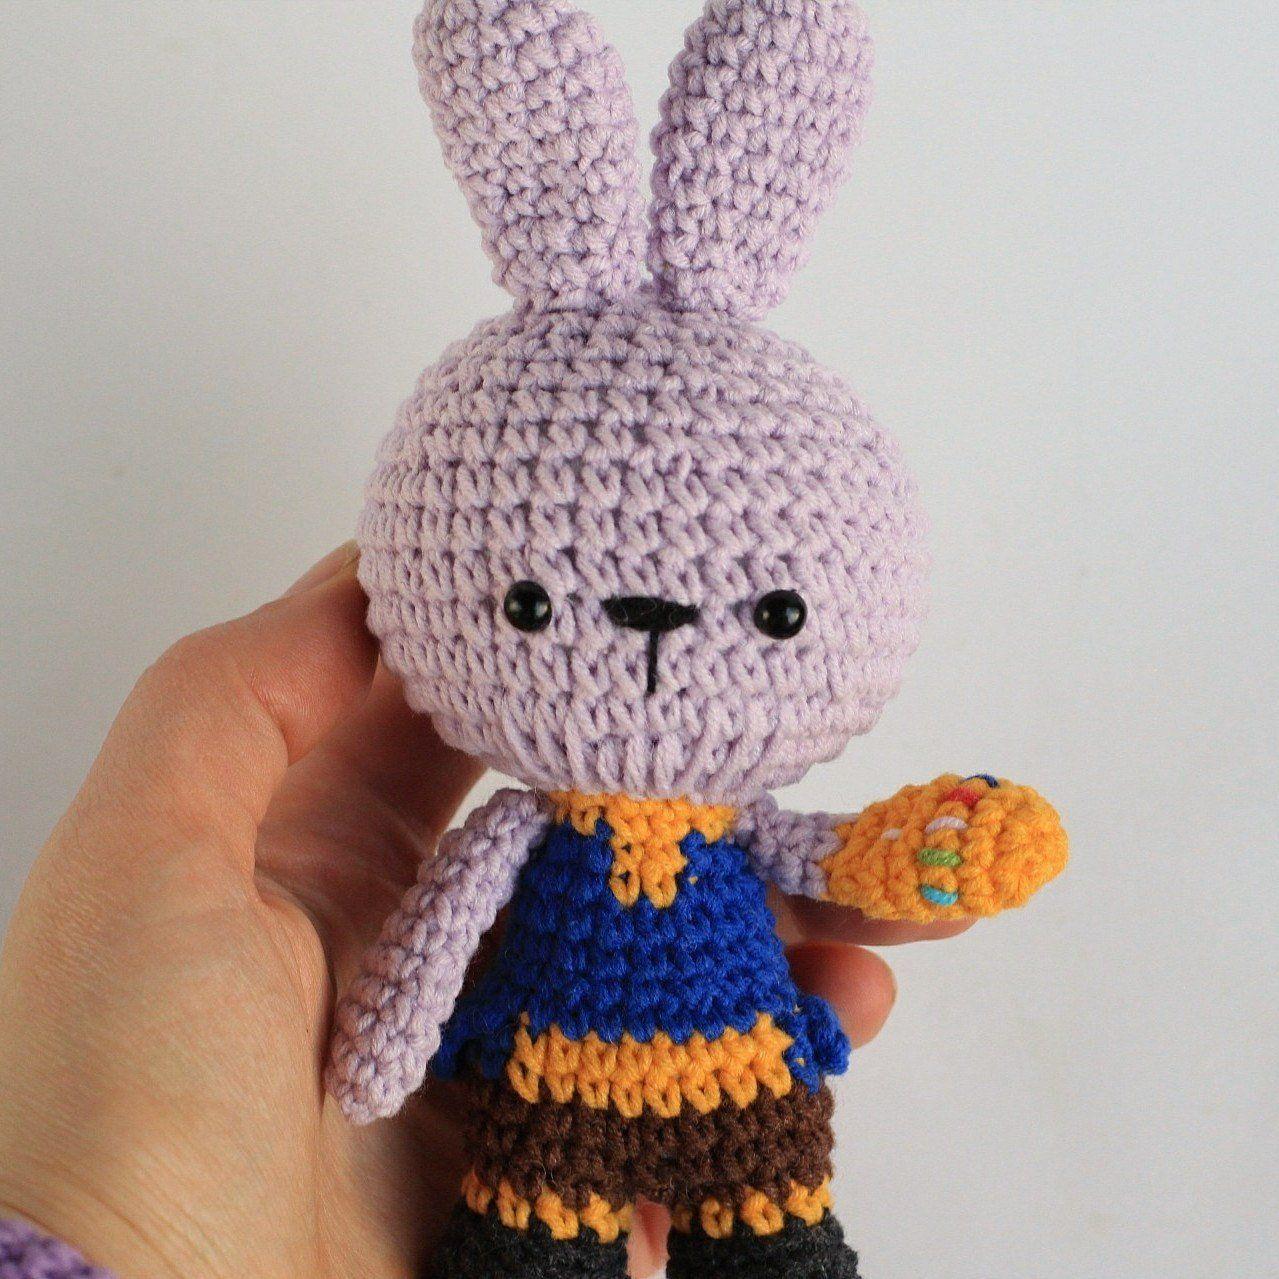 Free crochet amigurumi snuggle pattern of Marvel Thanos   1279x1279